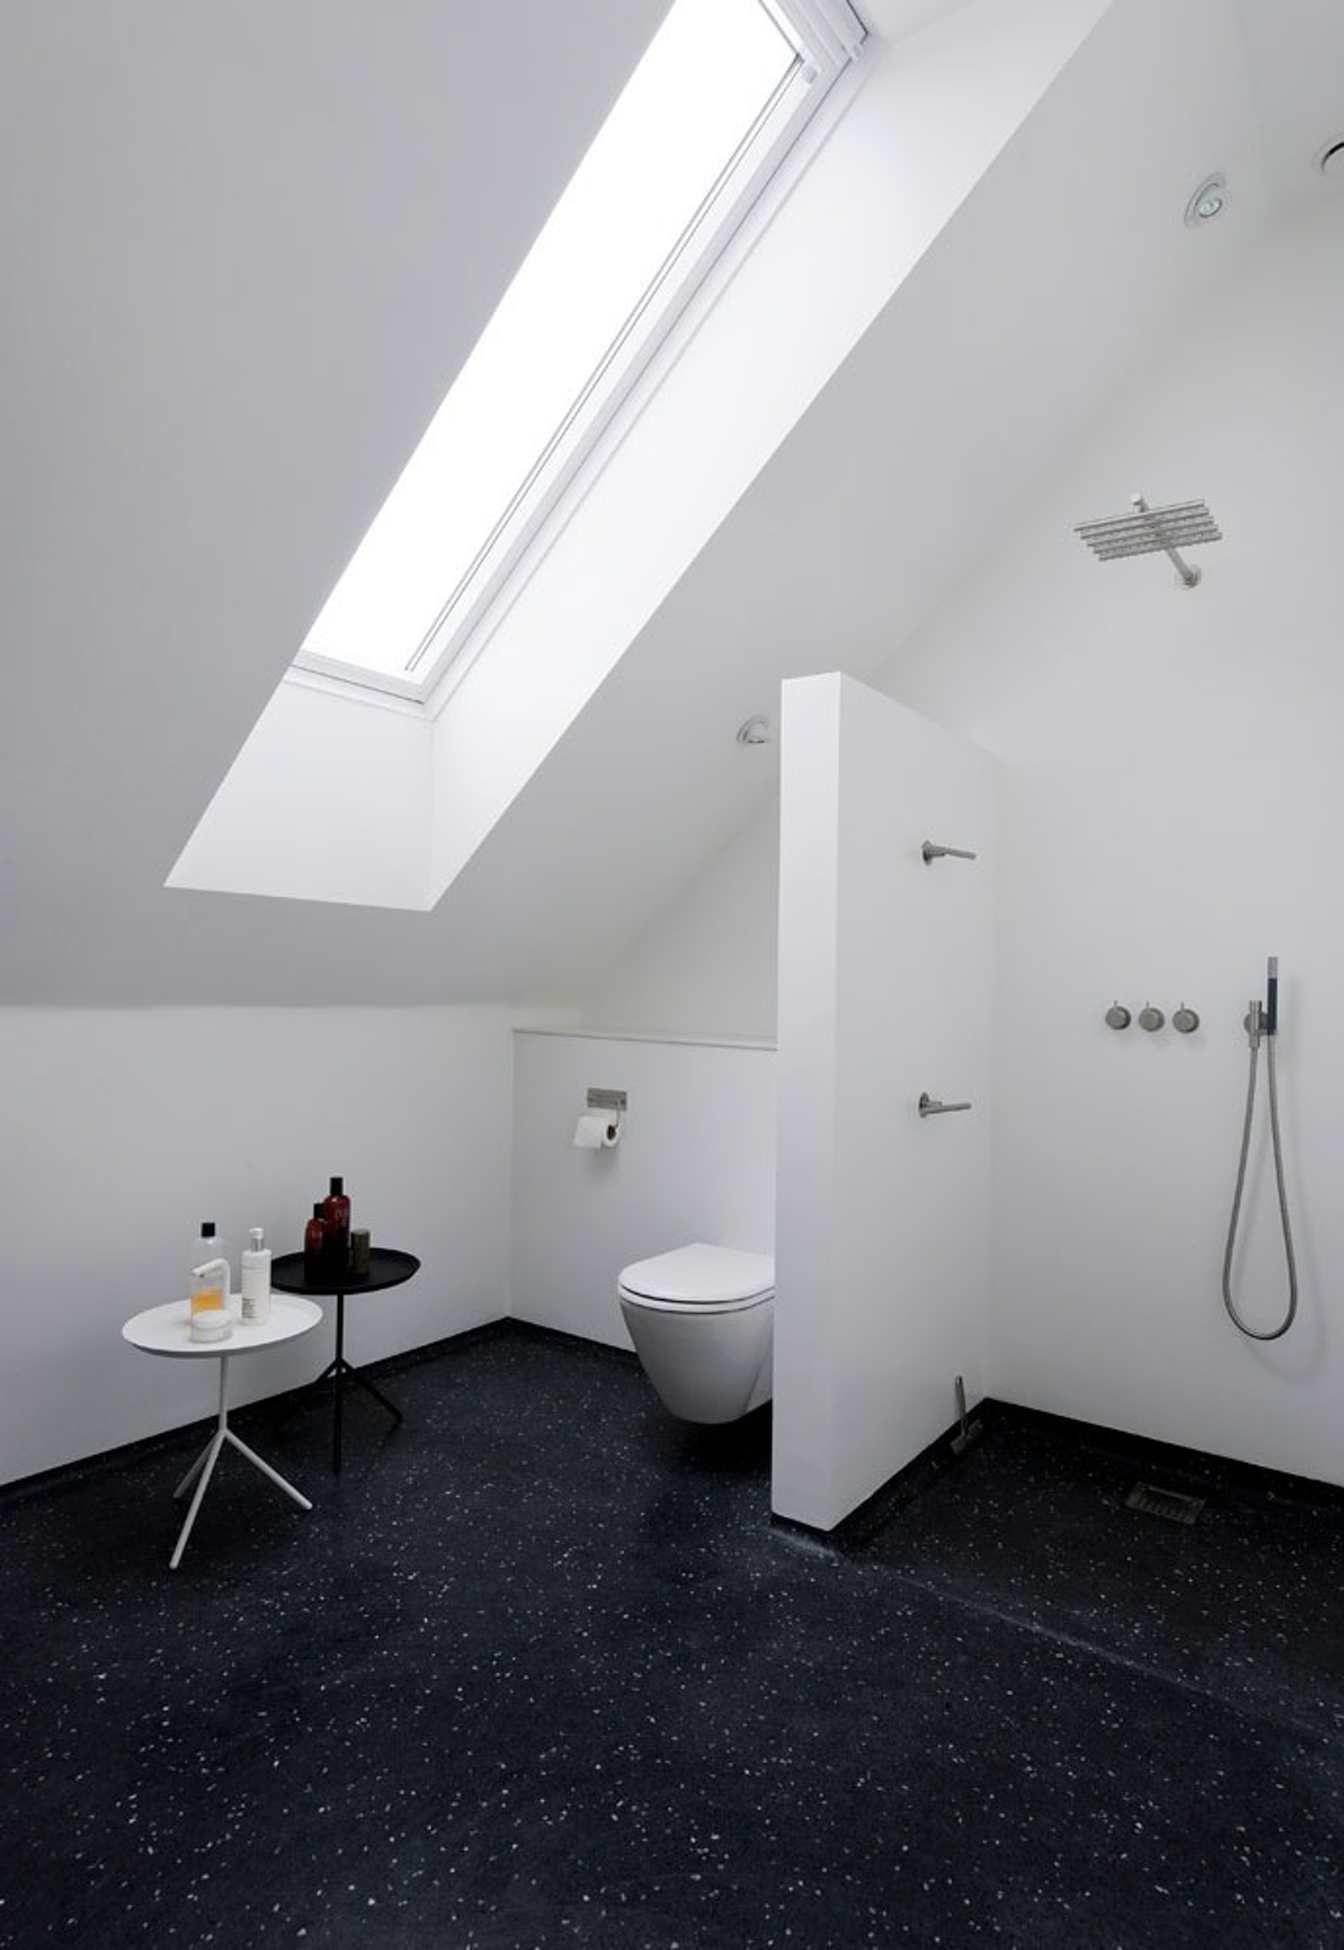 Velux window ideas  kattegat i sigte  lille scandinavian bathroom and interior